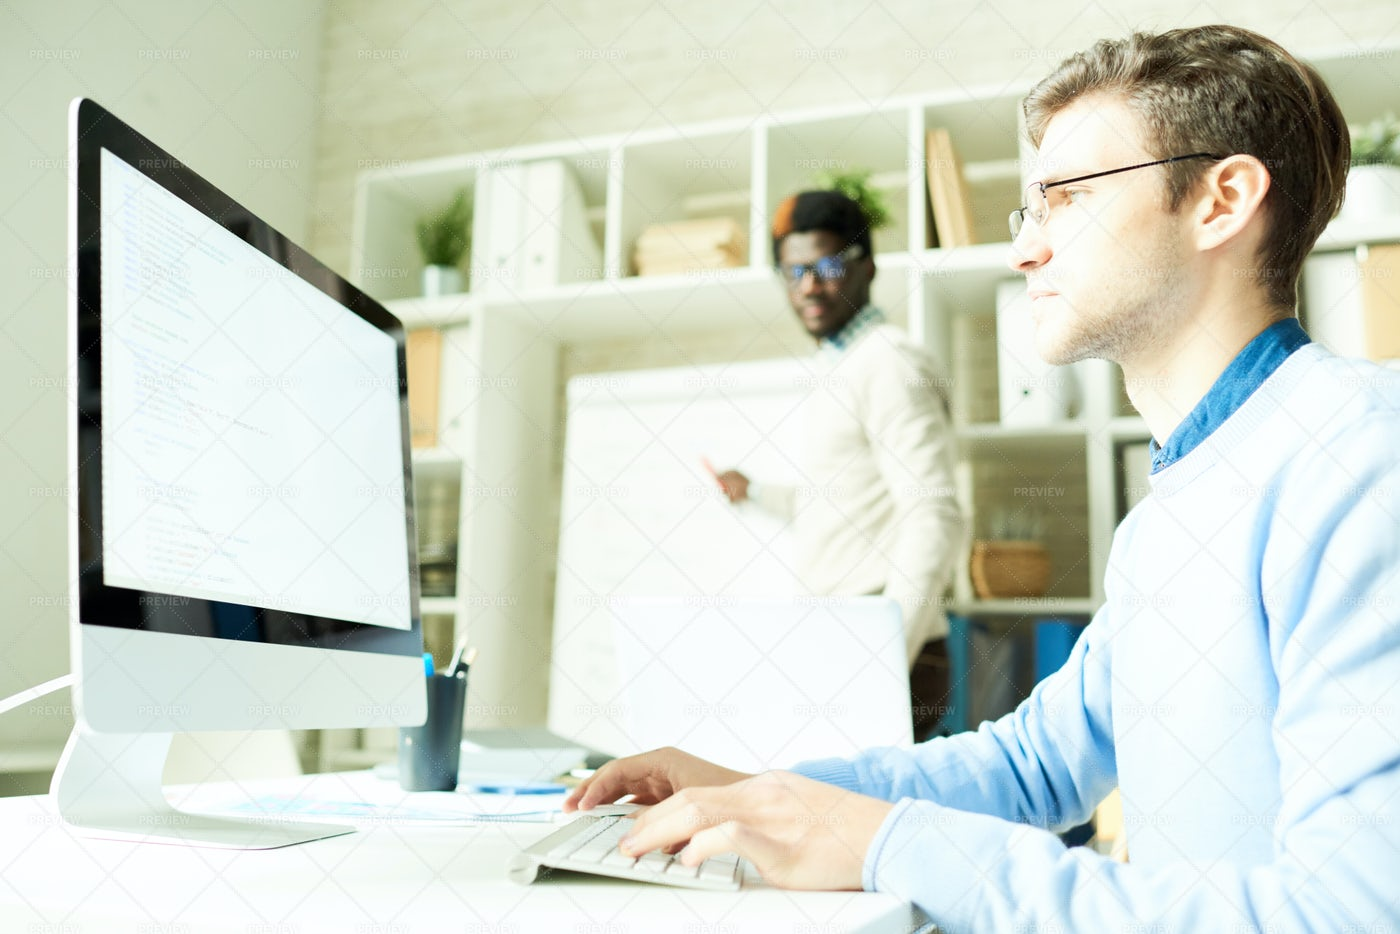 IT Specialists In Web Studio: Stock Photos